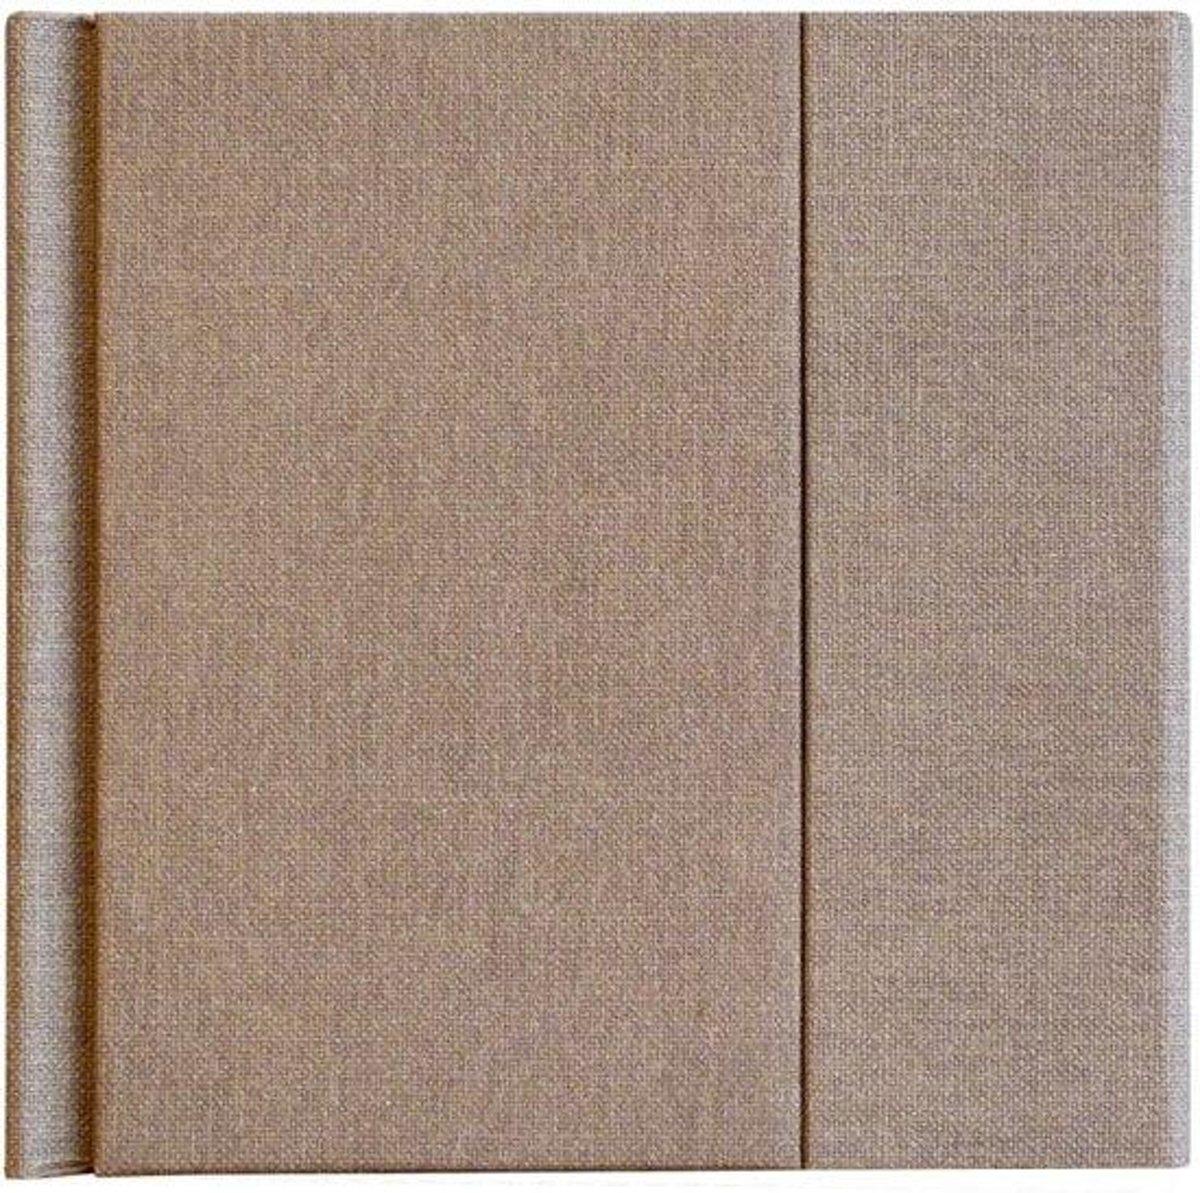 FotoHolland -Zelfklevend Fotoalbum 20x20 cm  - 12 pagina's wit Canvas donkerbruin / walnoot - TEC202012WA